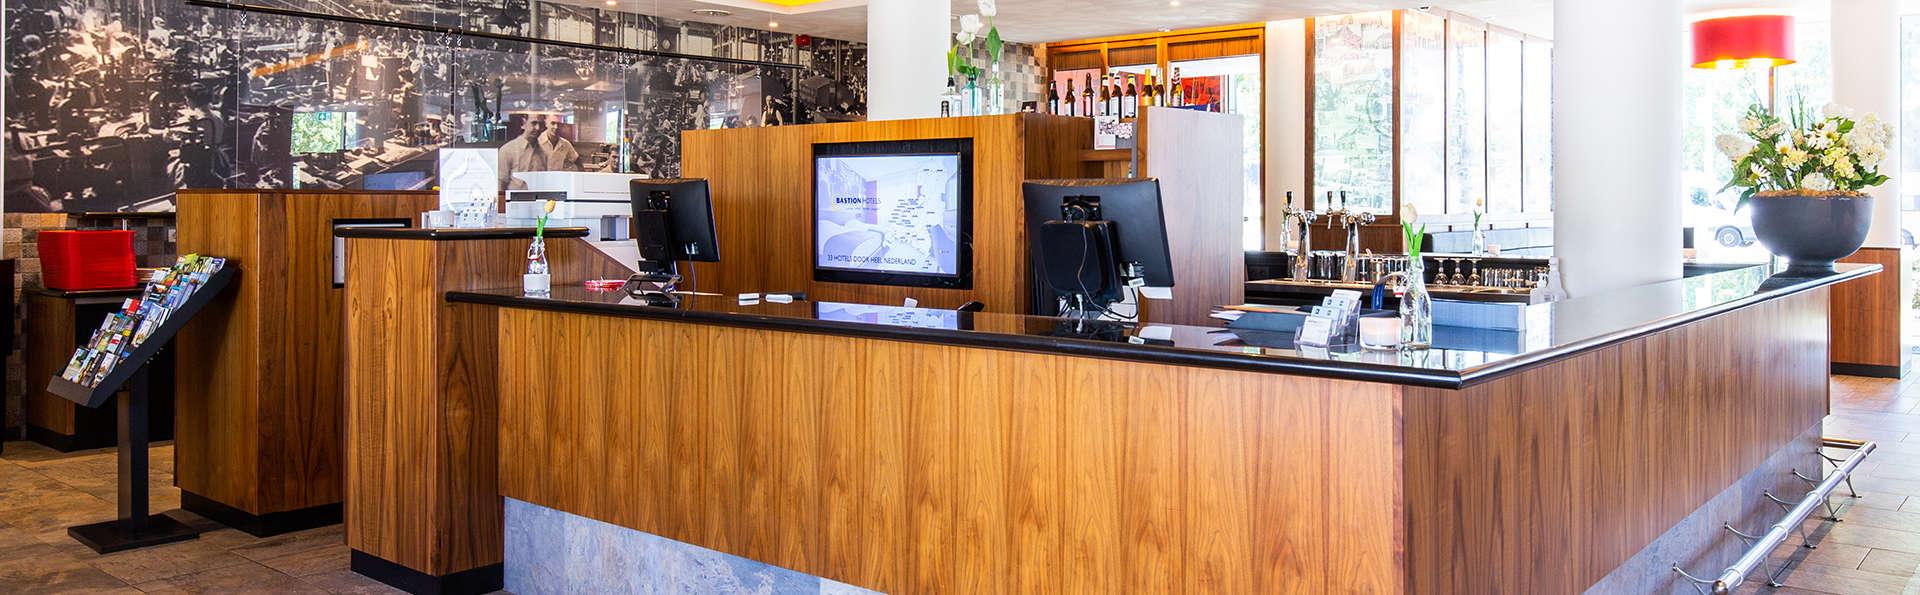 Bastion Hotel Tilburg - EDIT_RECEPTIE.jpg